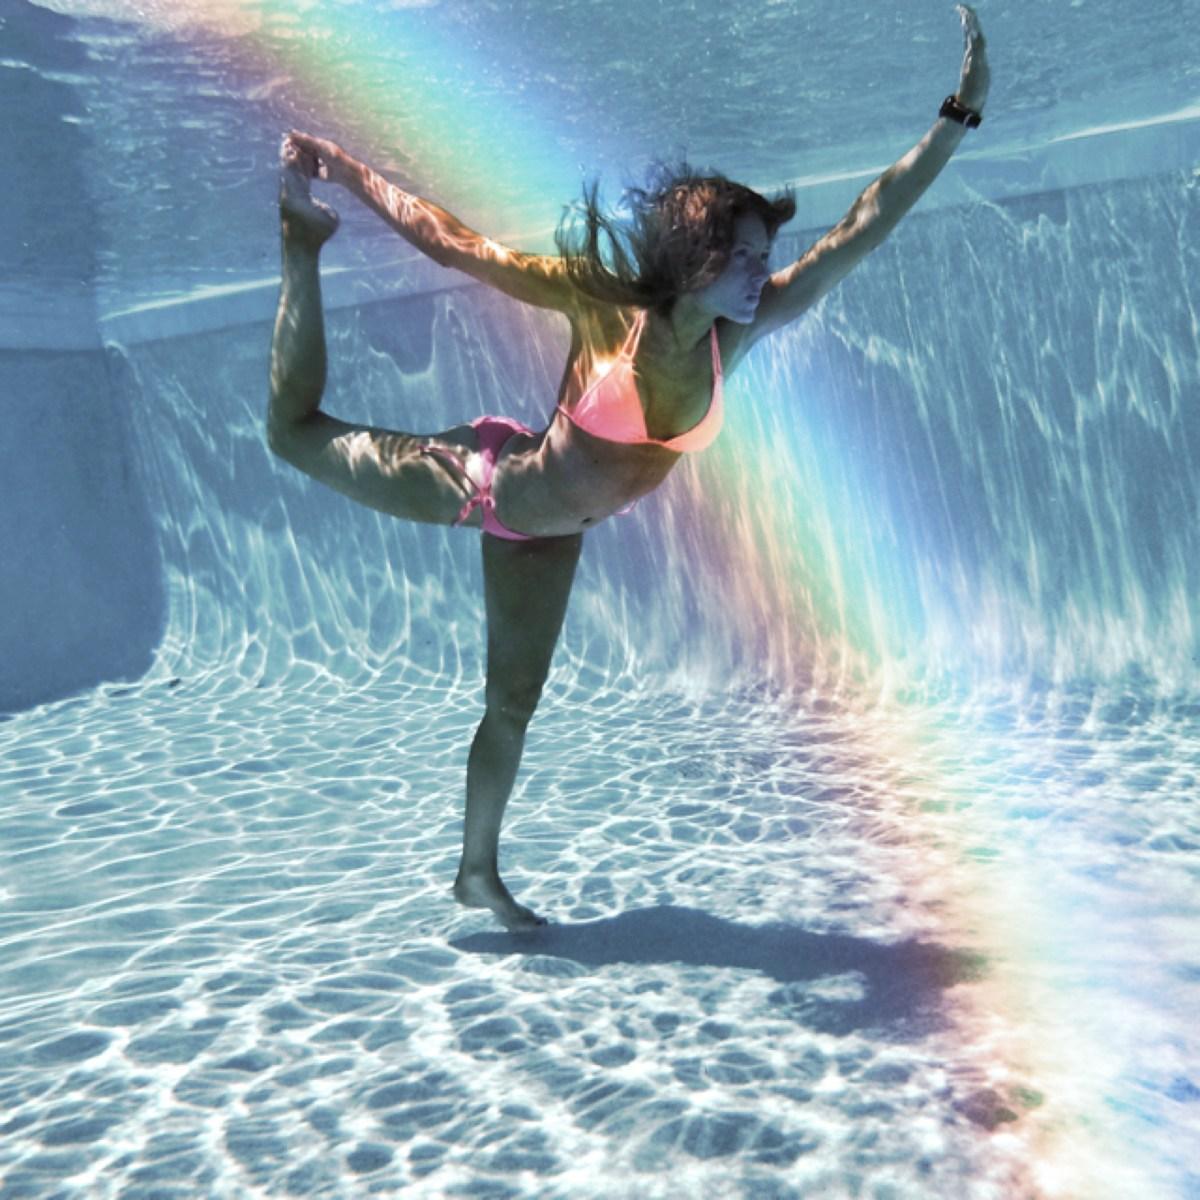 Best-Rainbow-Photo-Filters-And-Rainbow-Photo-Editor-App-5